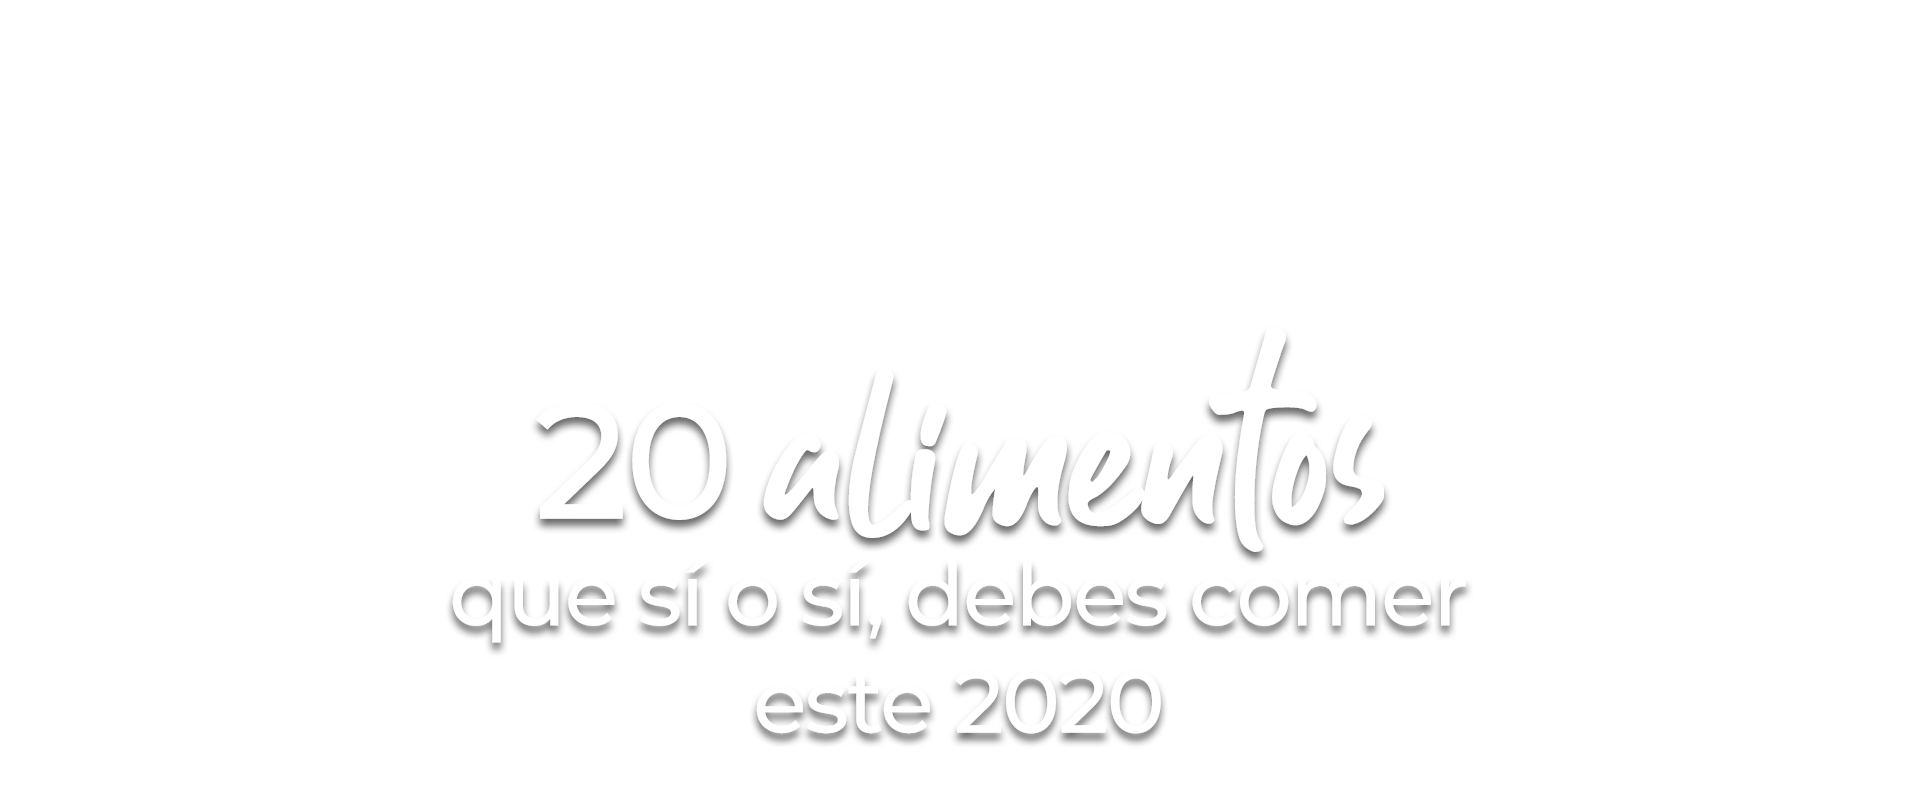 20 alimentos que sí o sí, debes comer este 2020